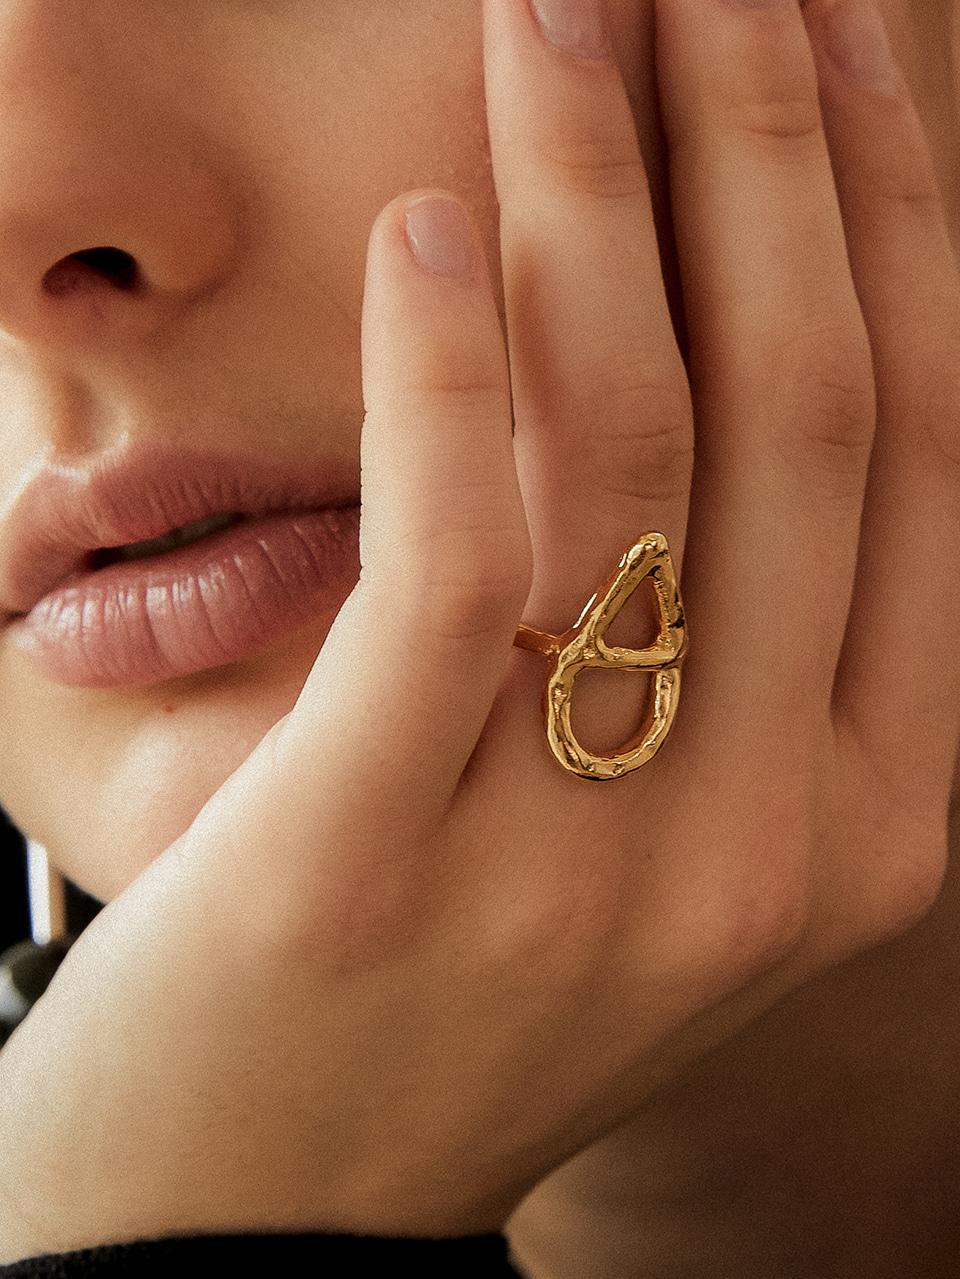 tear ring